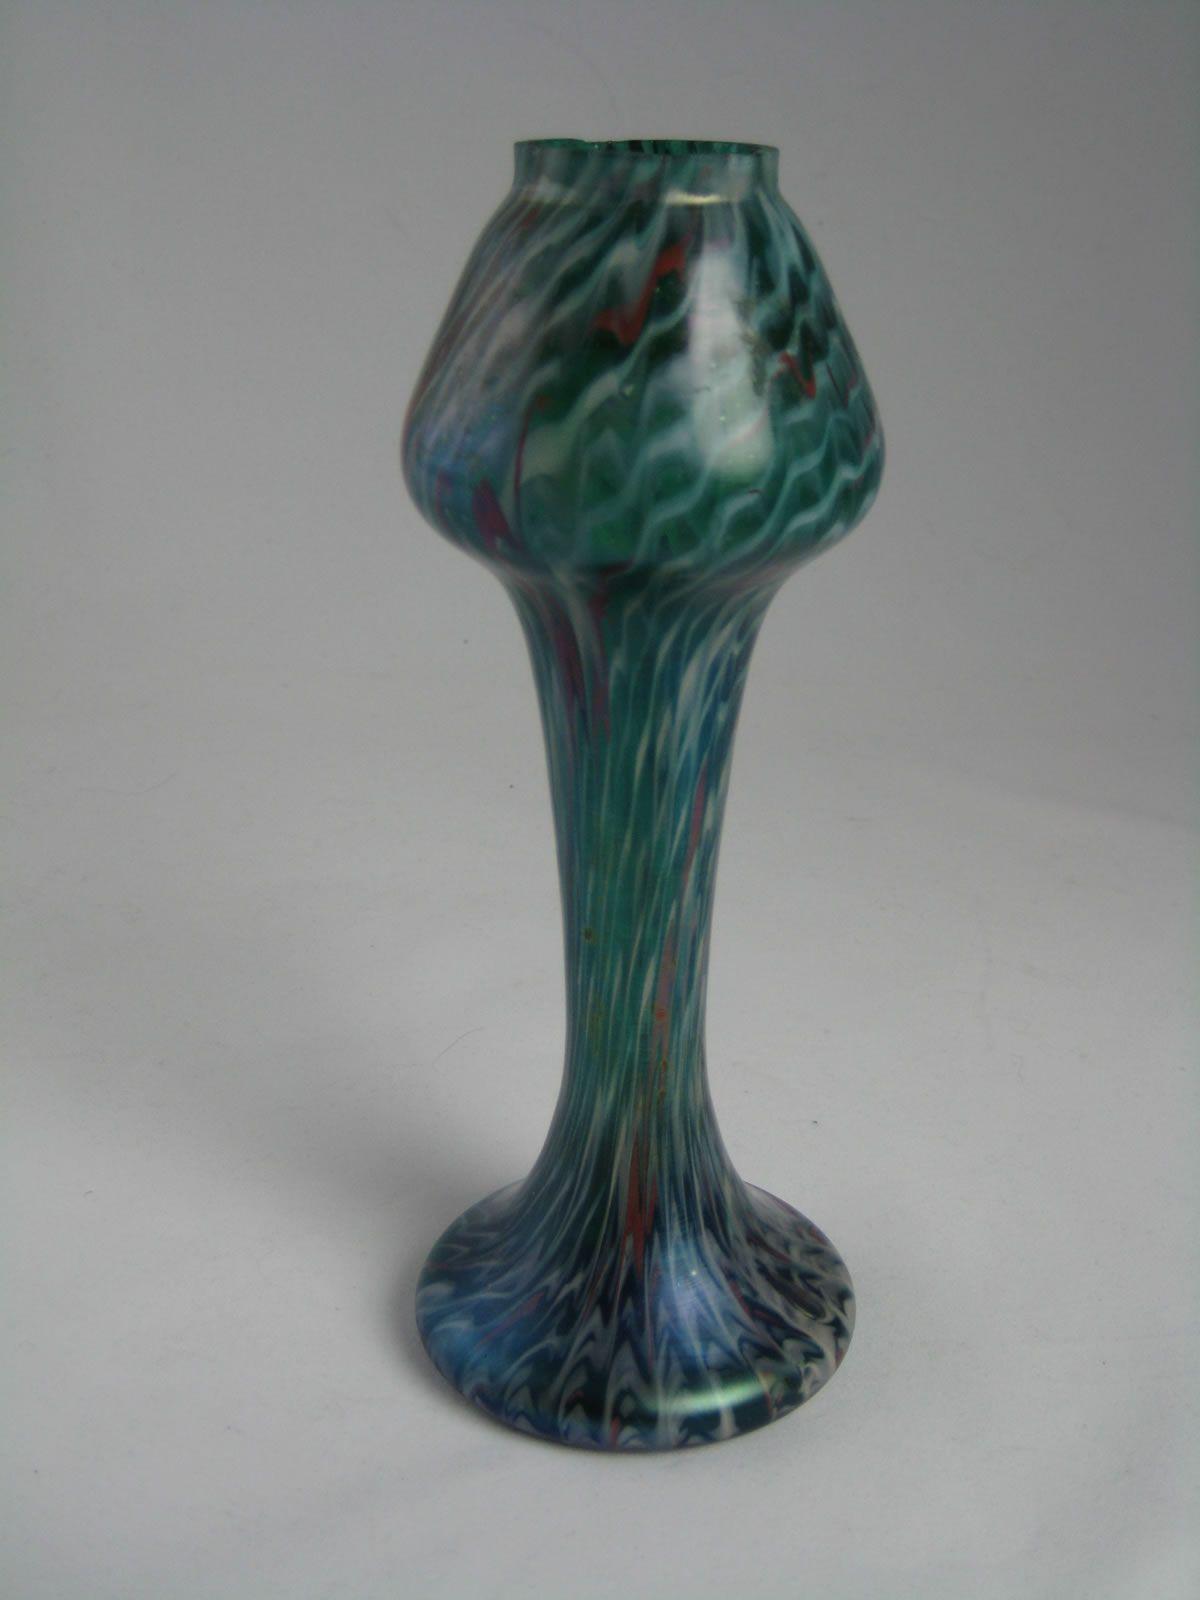 Decorative glass art rindskopf marbled vase art nouveau glass decorative glass art rindskopf marbled vase art nouveau glass decorative arts reviewsmspy